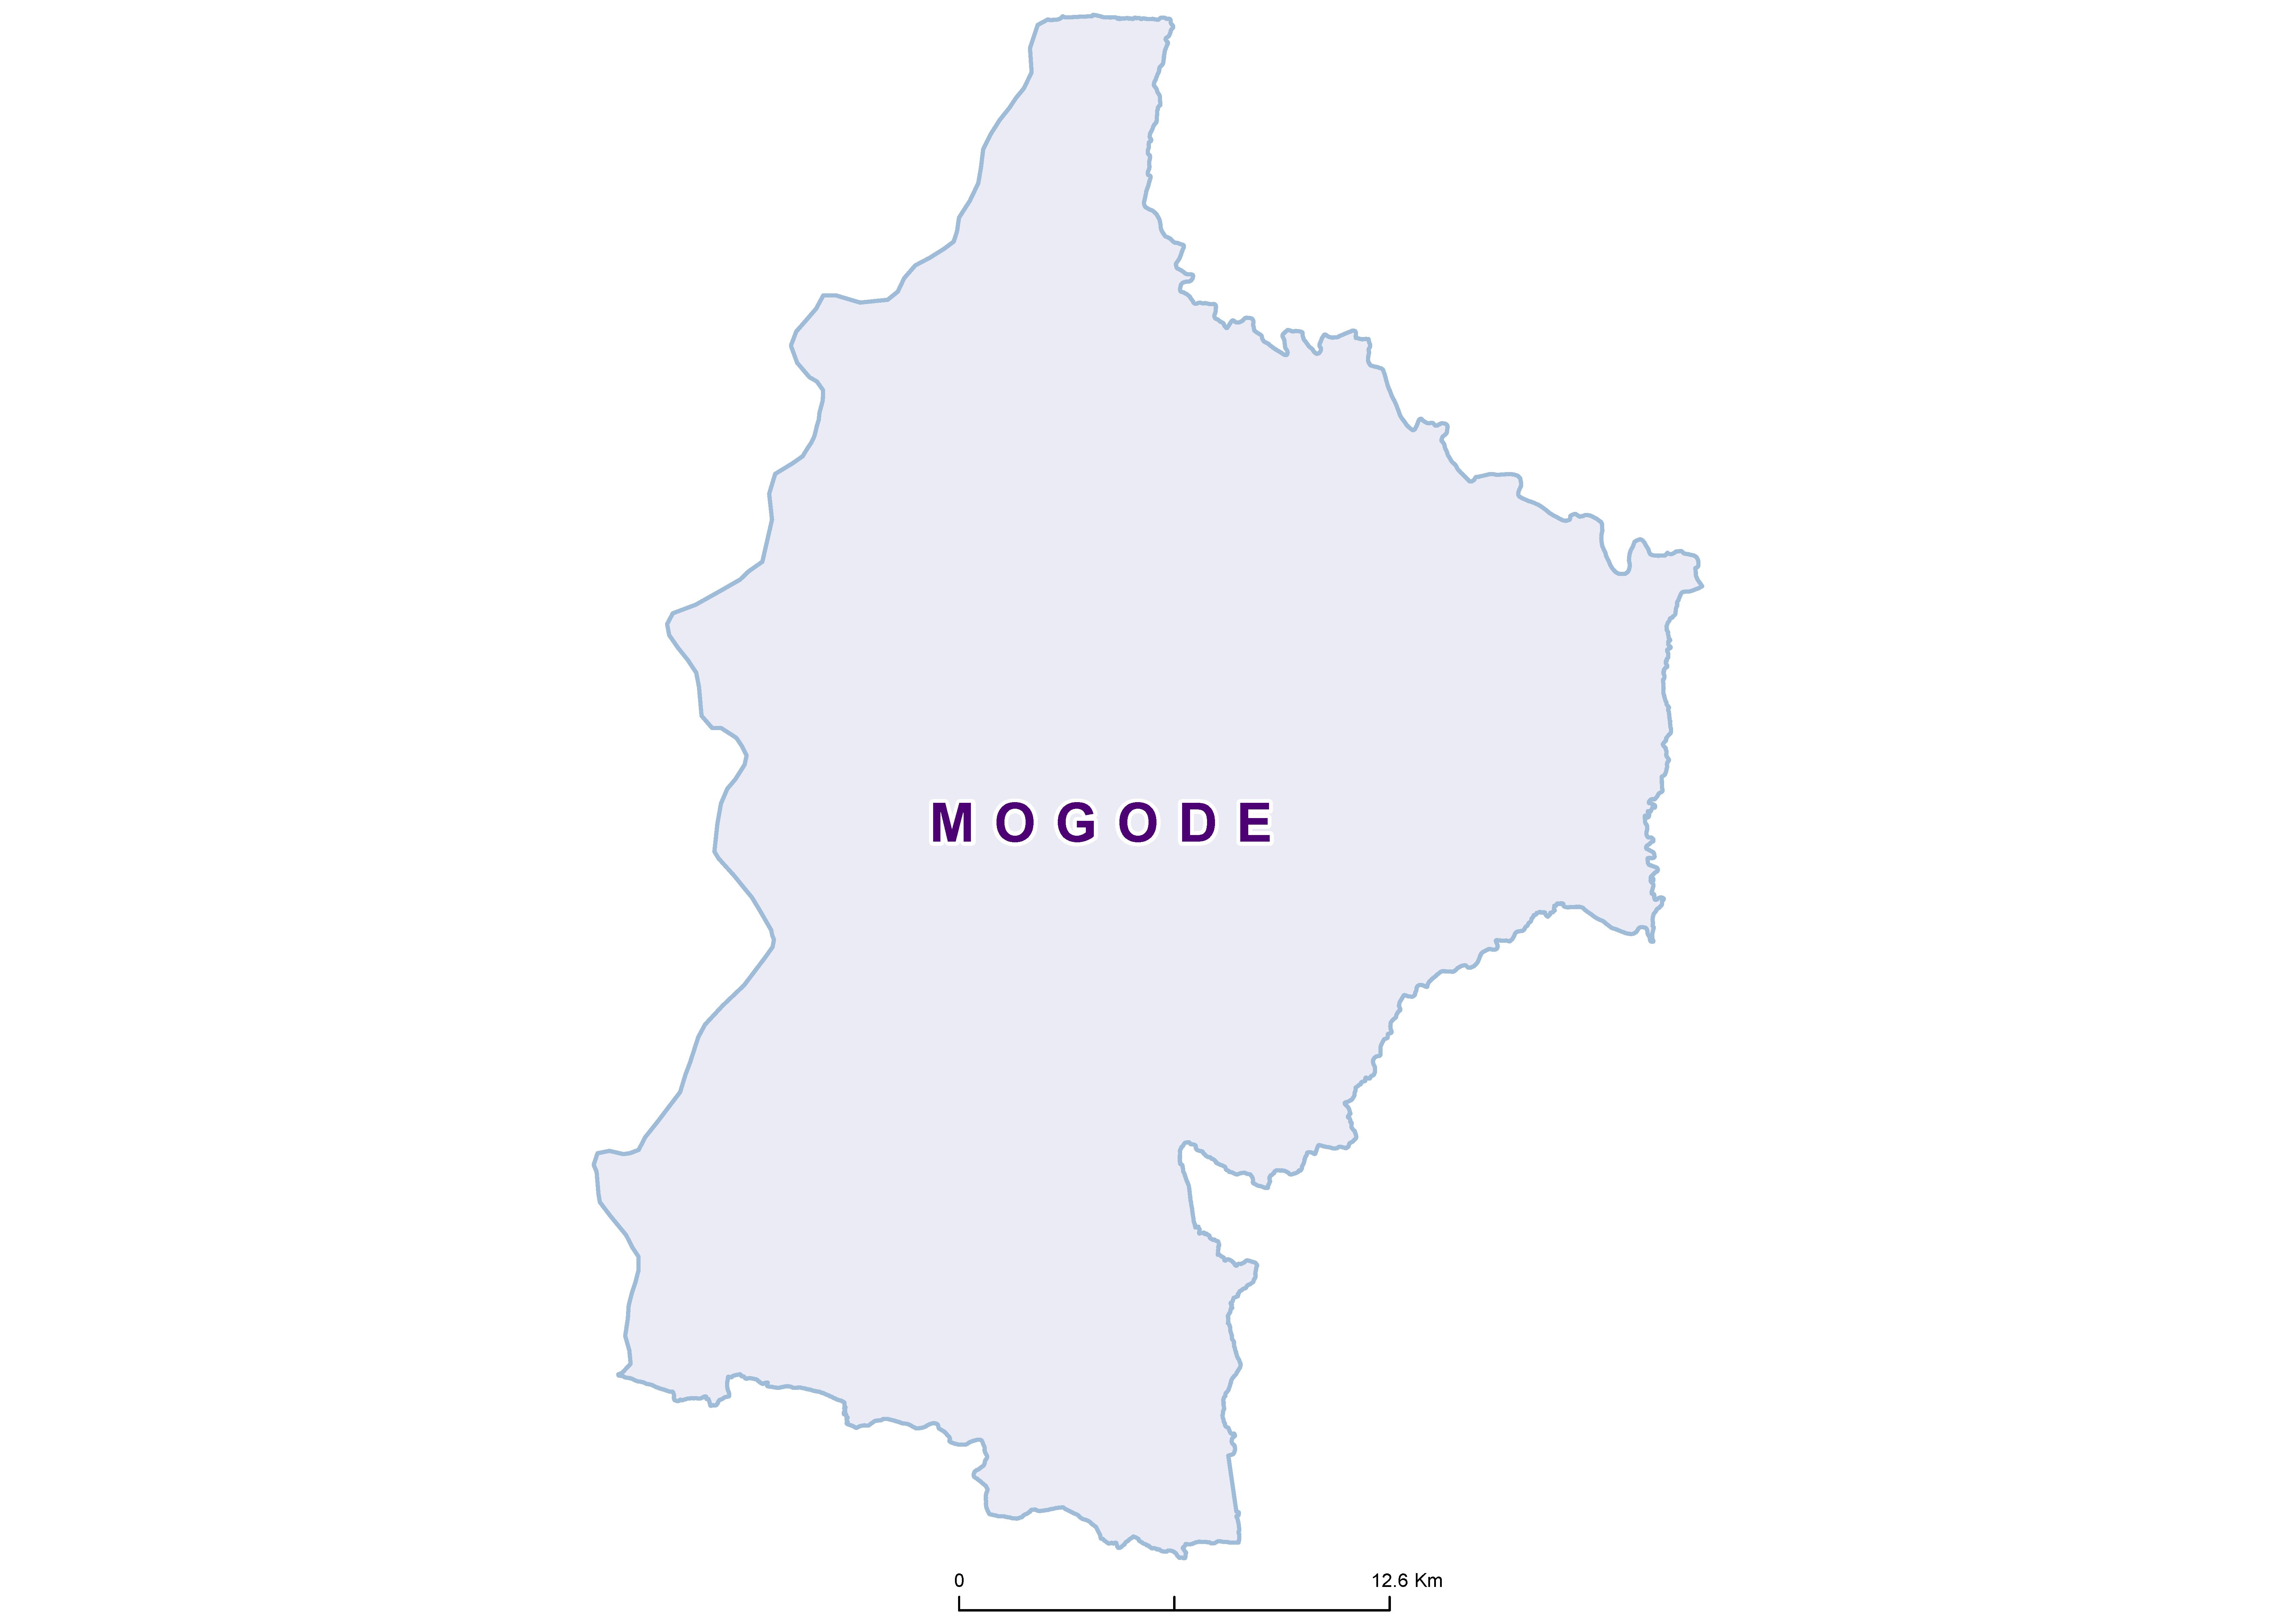 Mogode Max STH 20180001